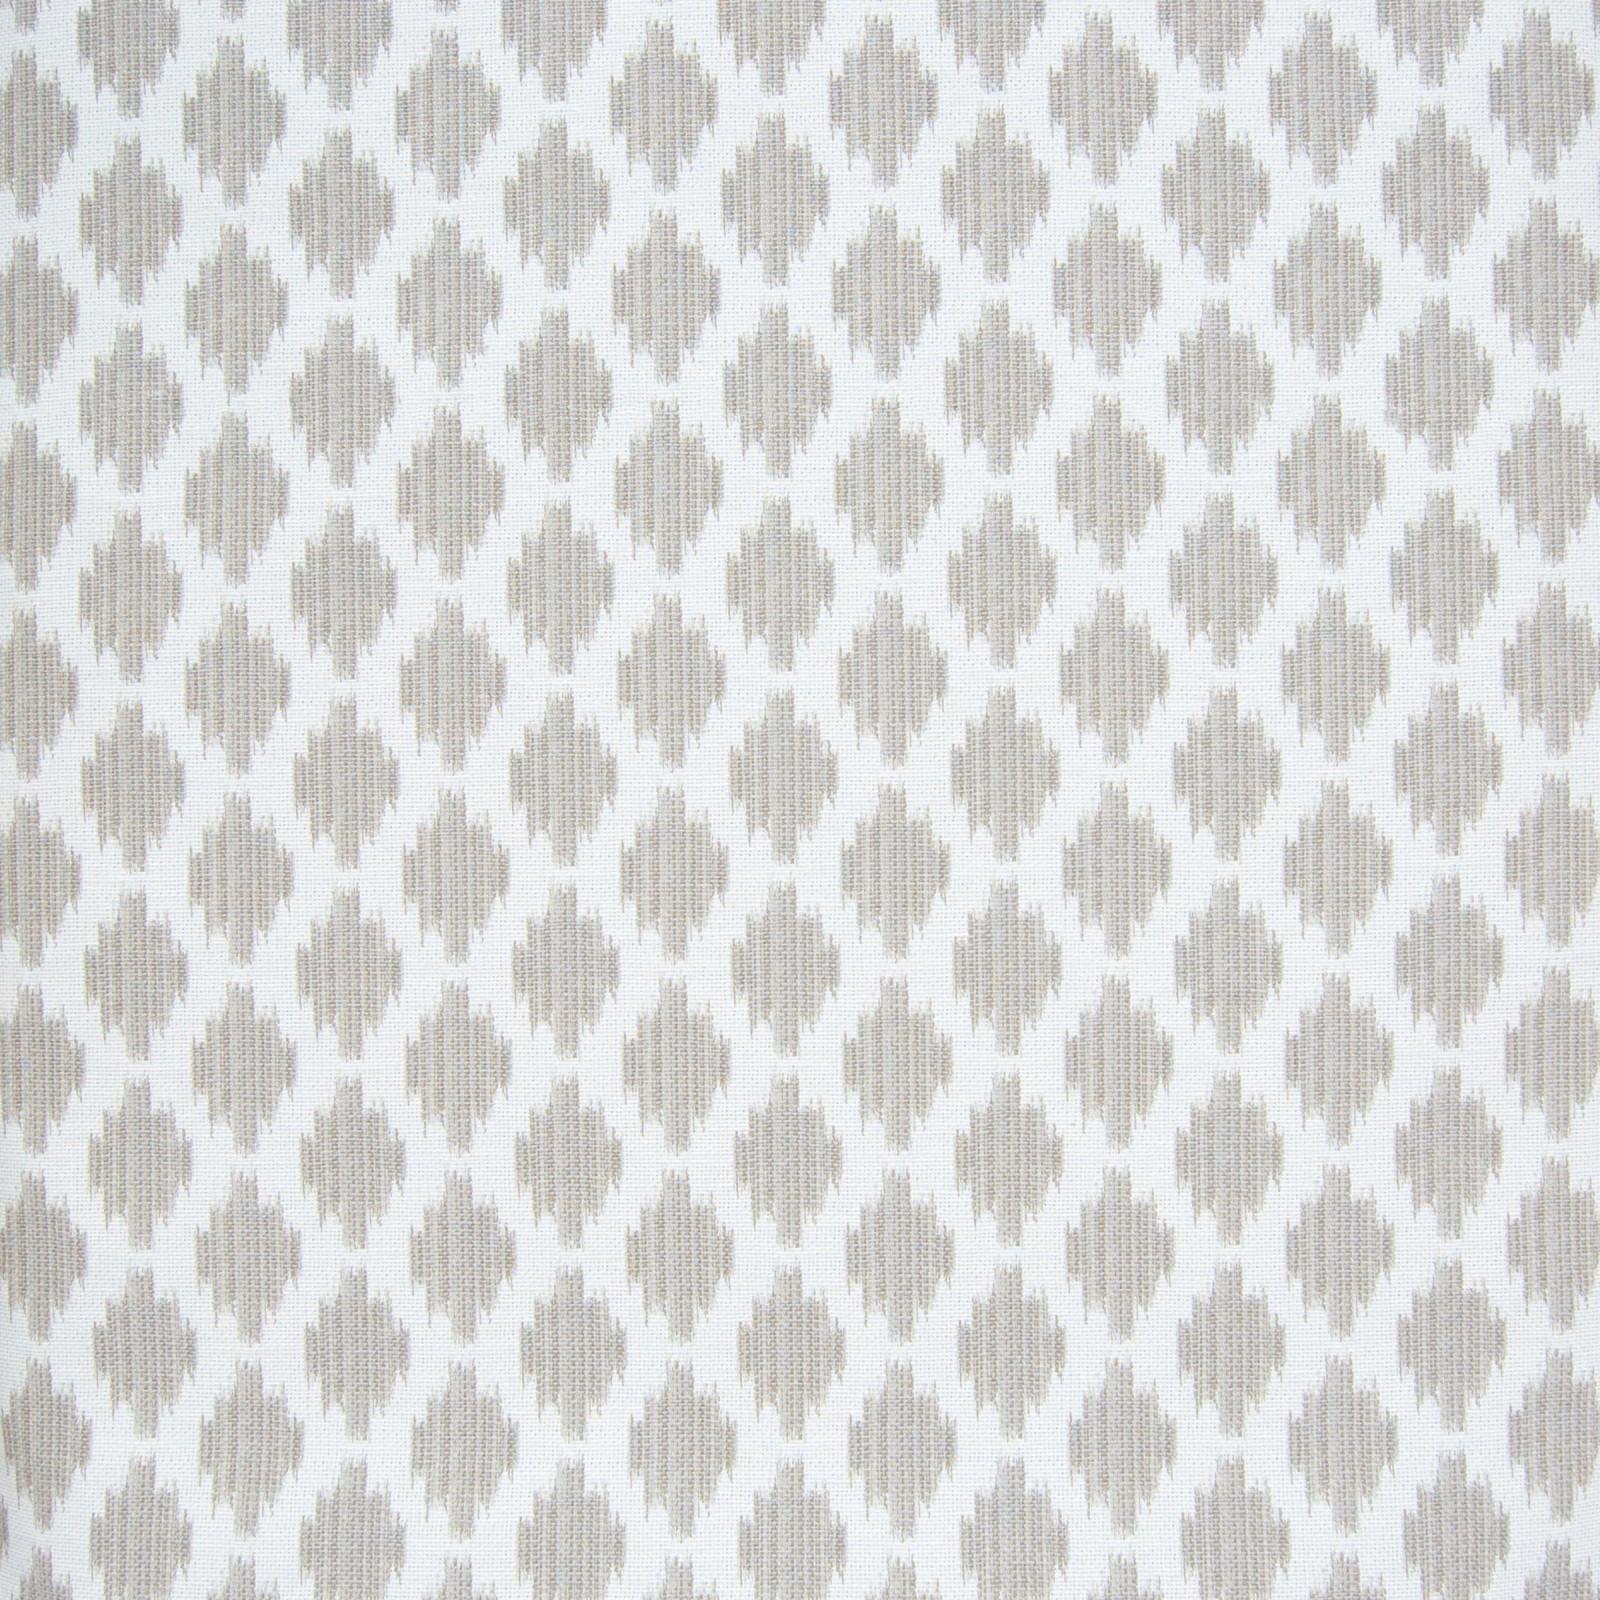 B7310 Taupe Greenhouse Fabrics